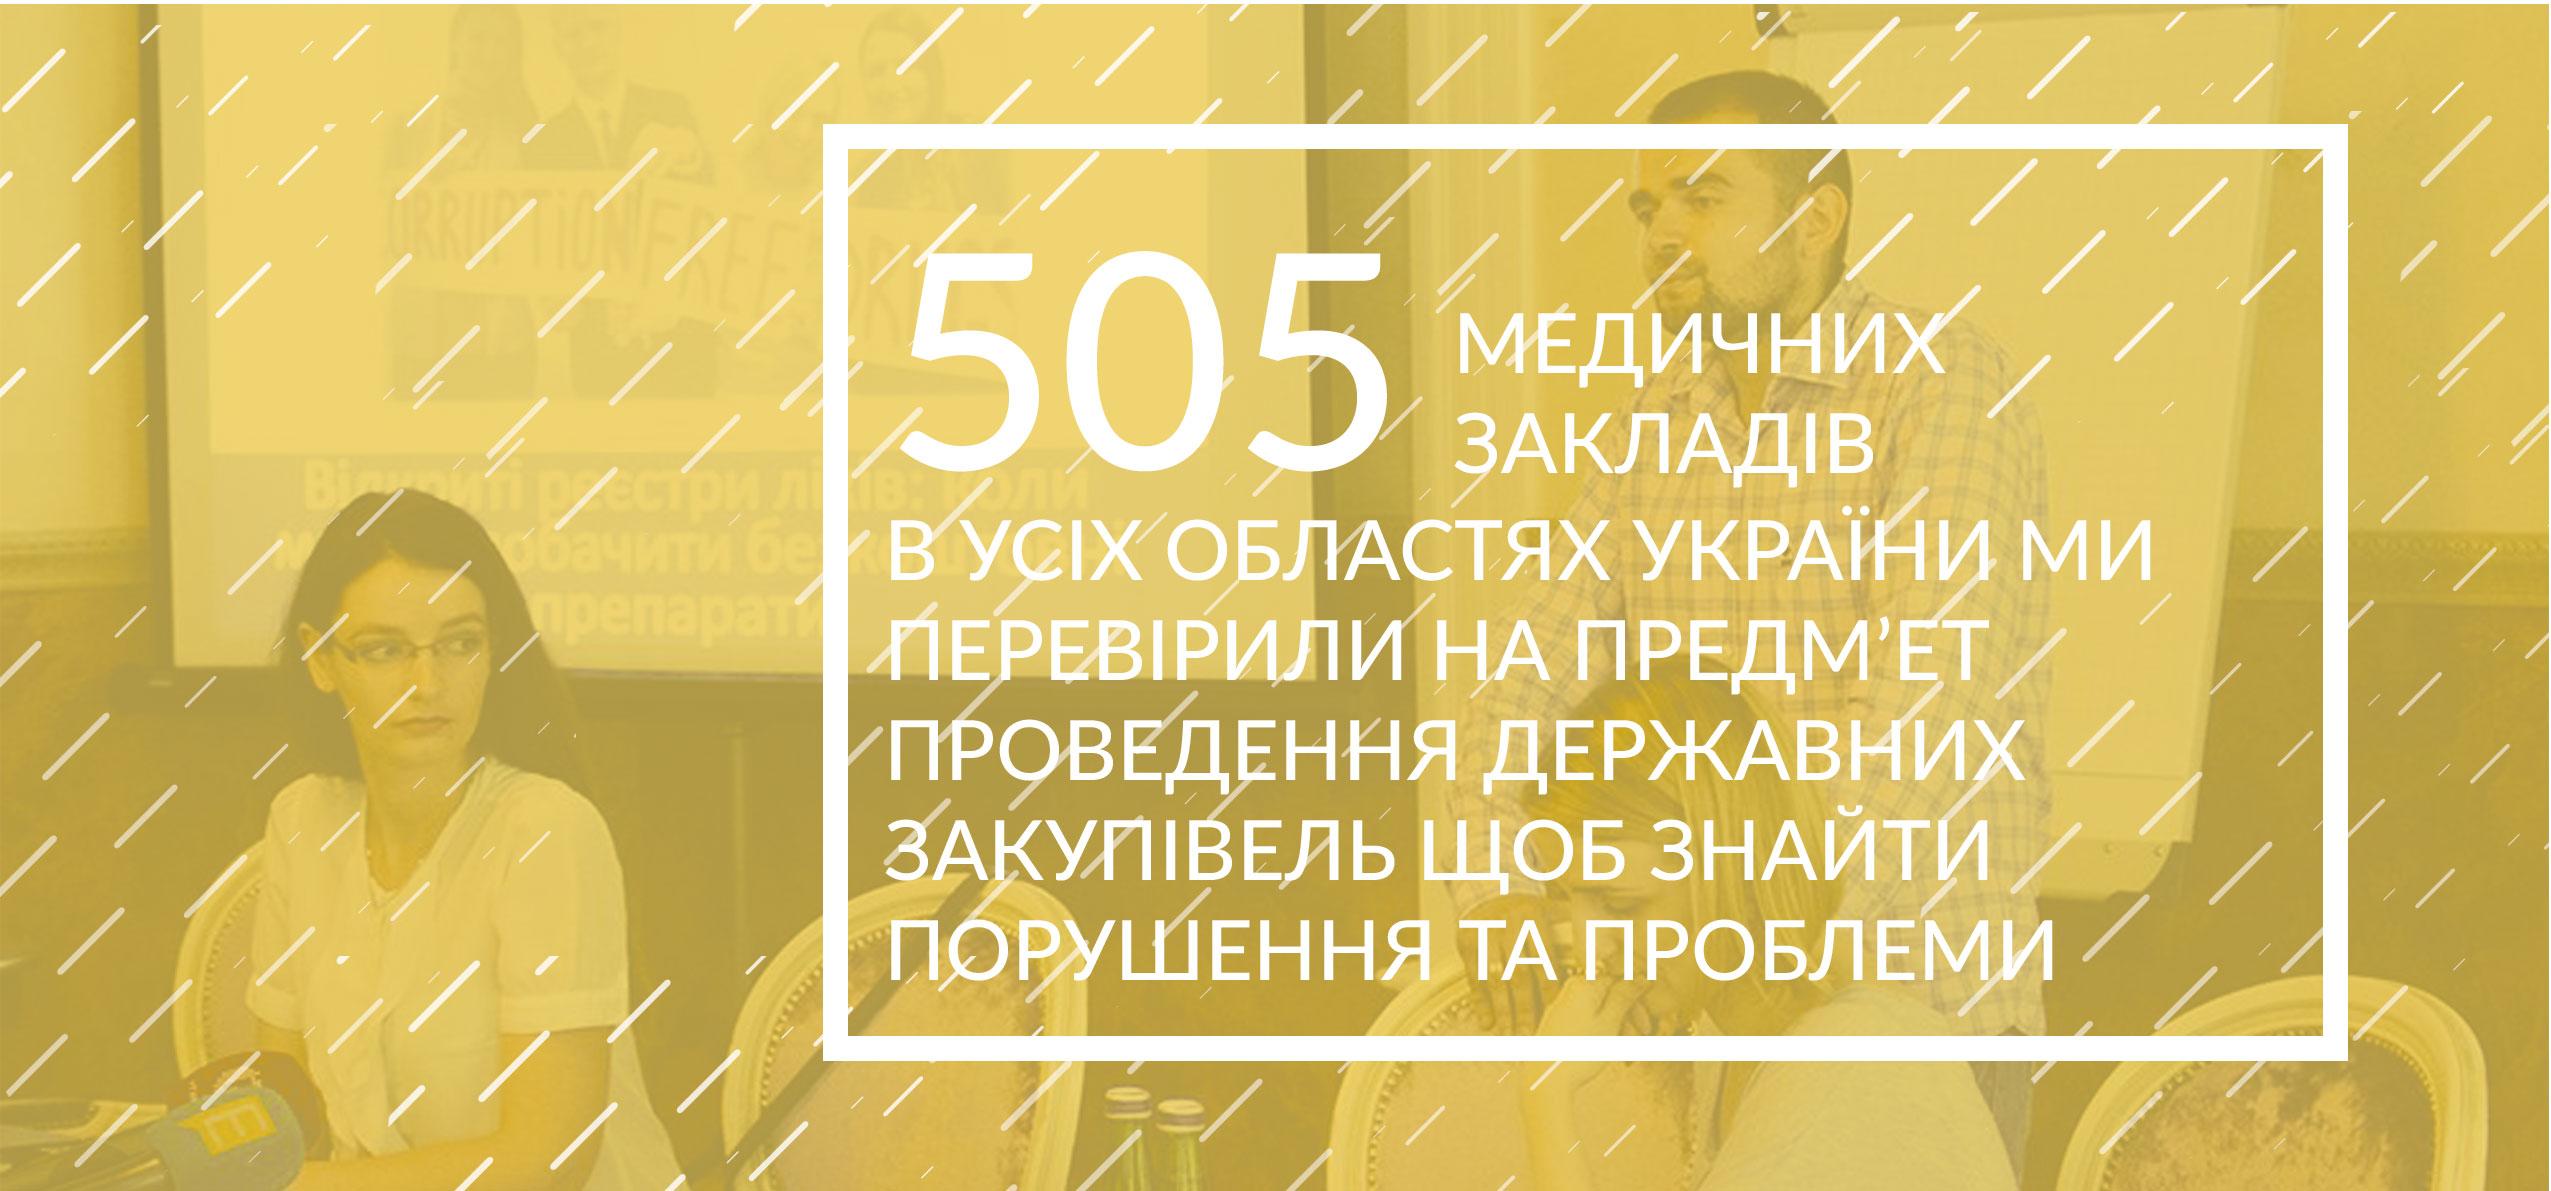 42Проекти2016-3